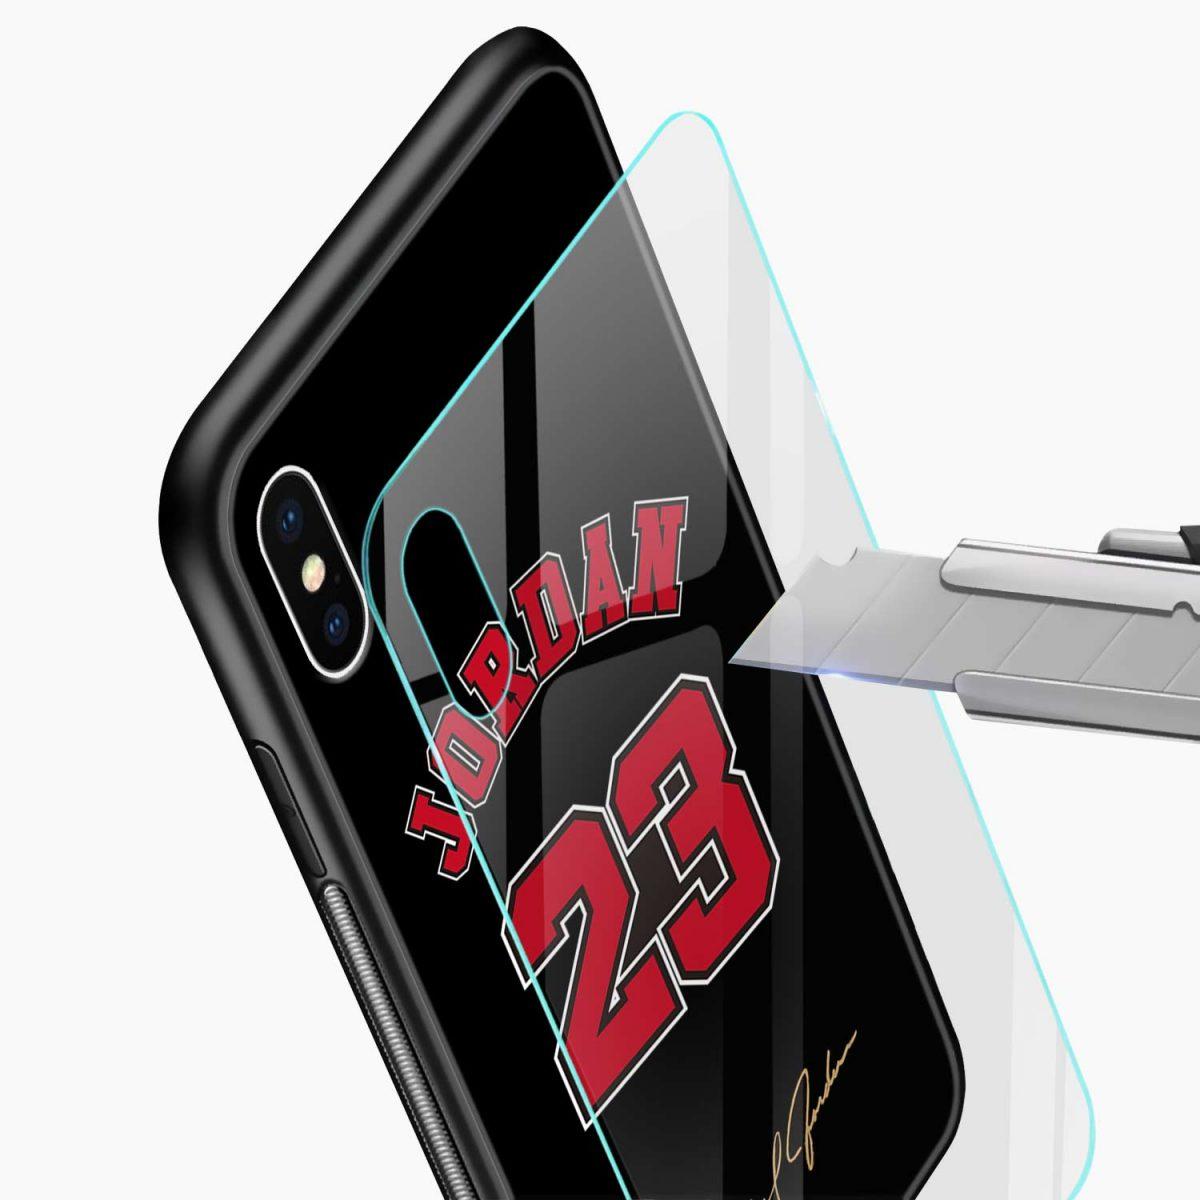 jordan 23 glass view apple iphone x xs max back cover